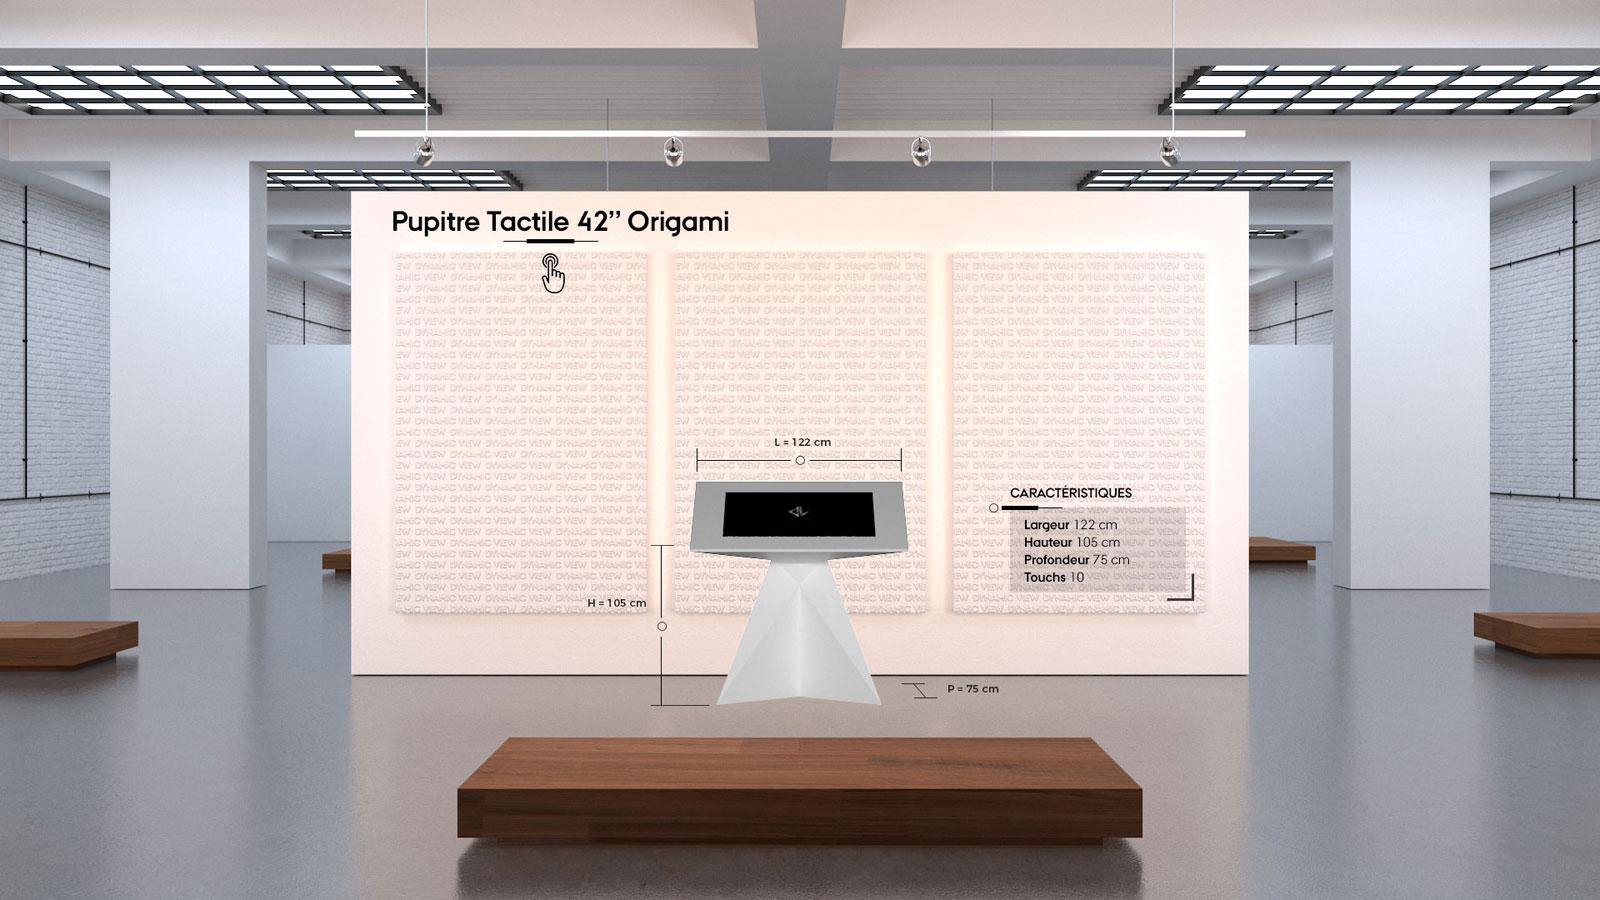 36 Pupitre Tactile 42'' Origami